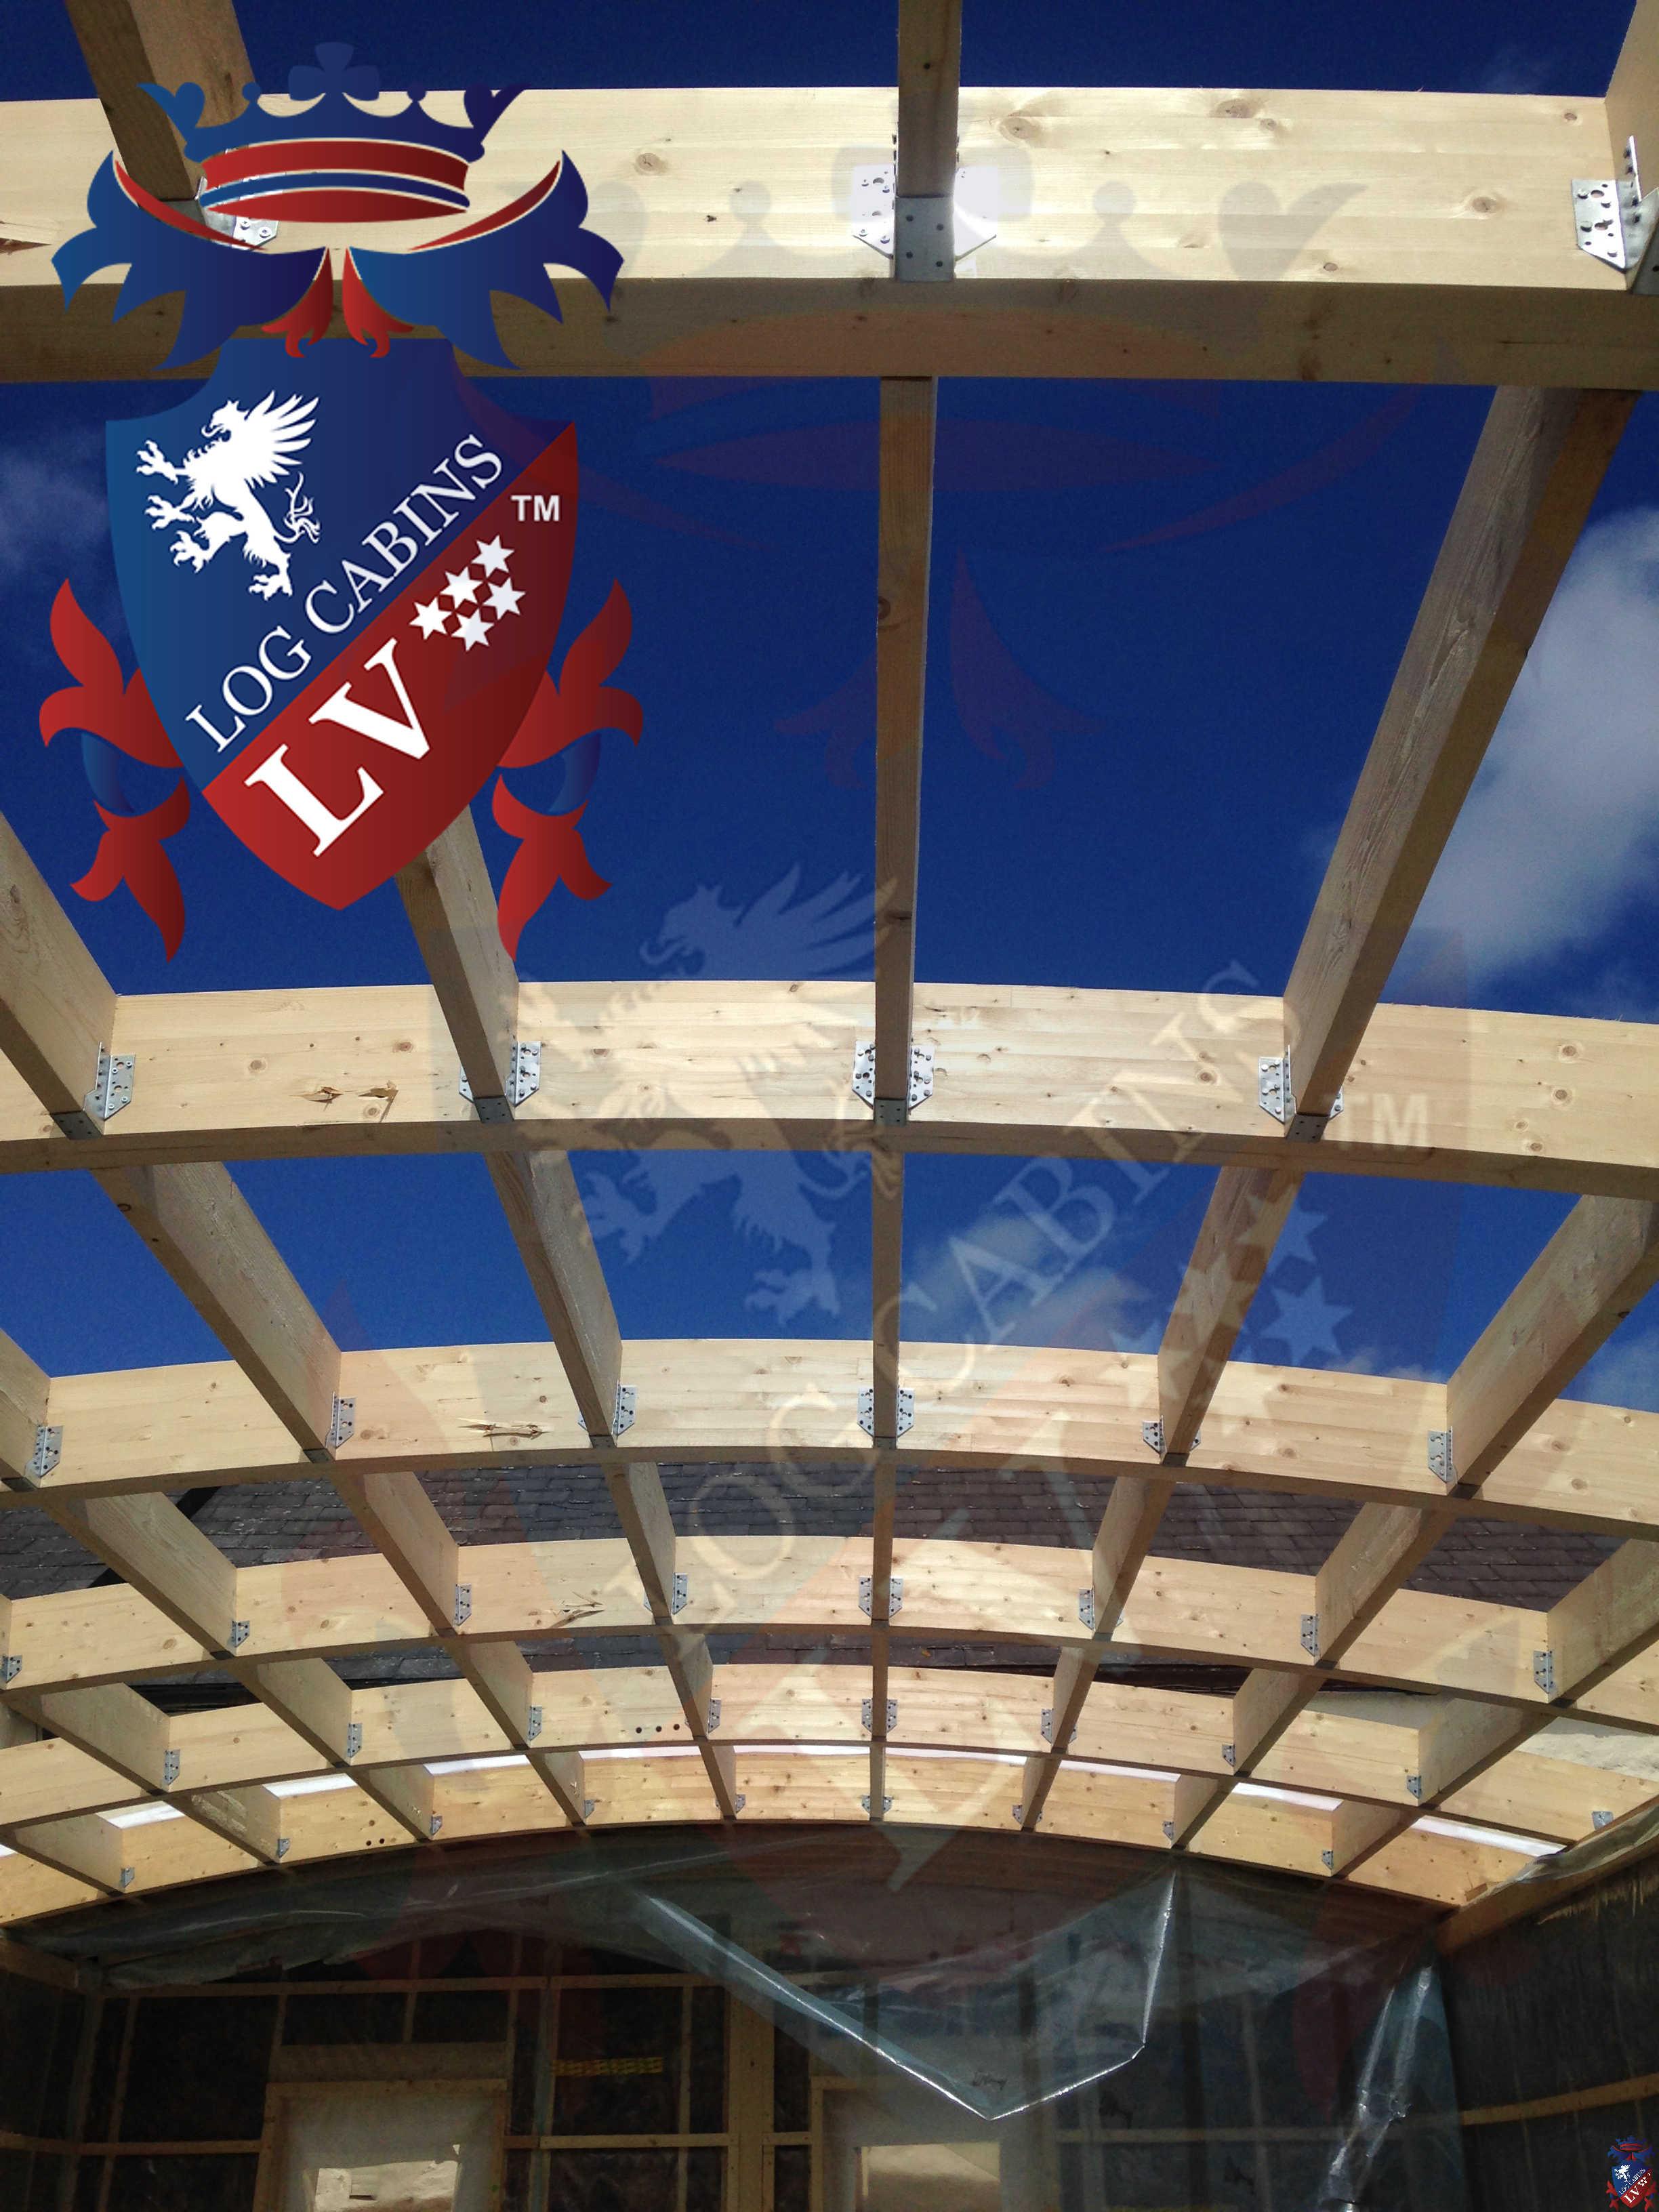 timber-frame-buildings-lv-09